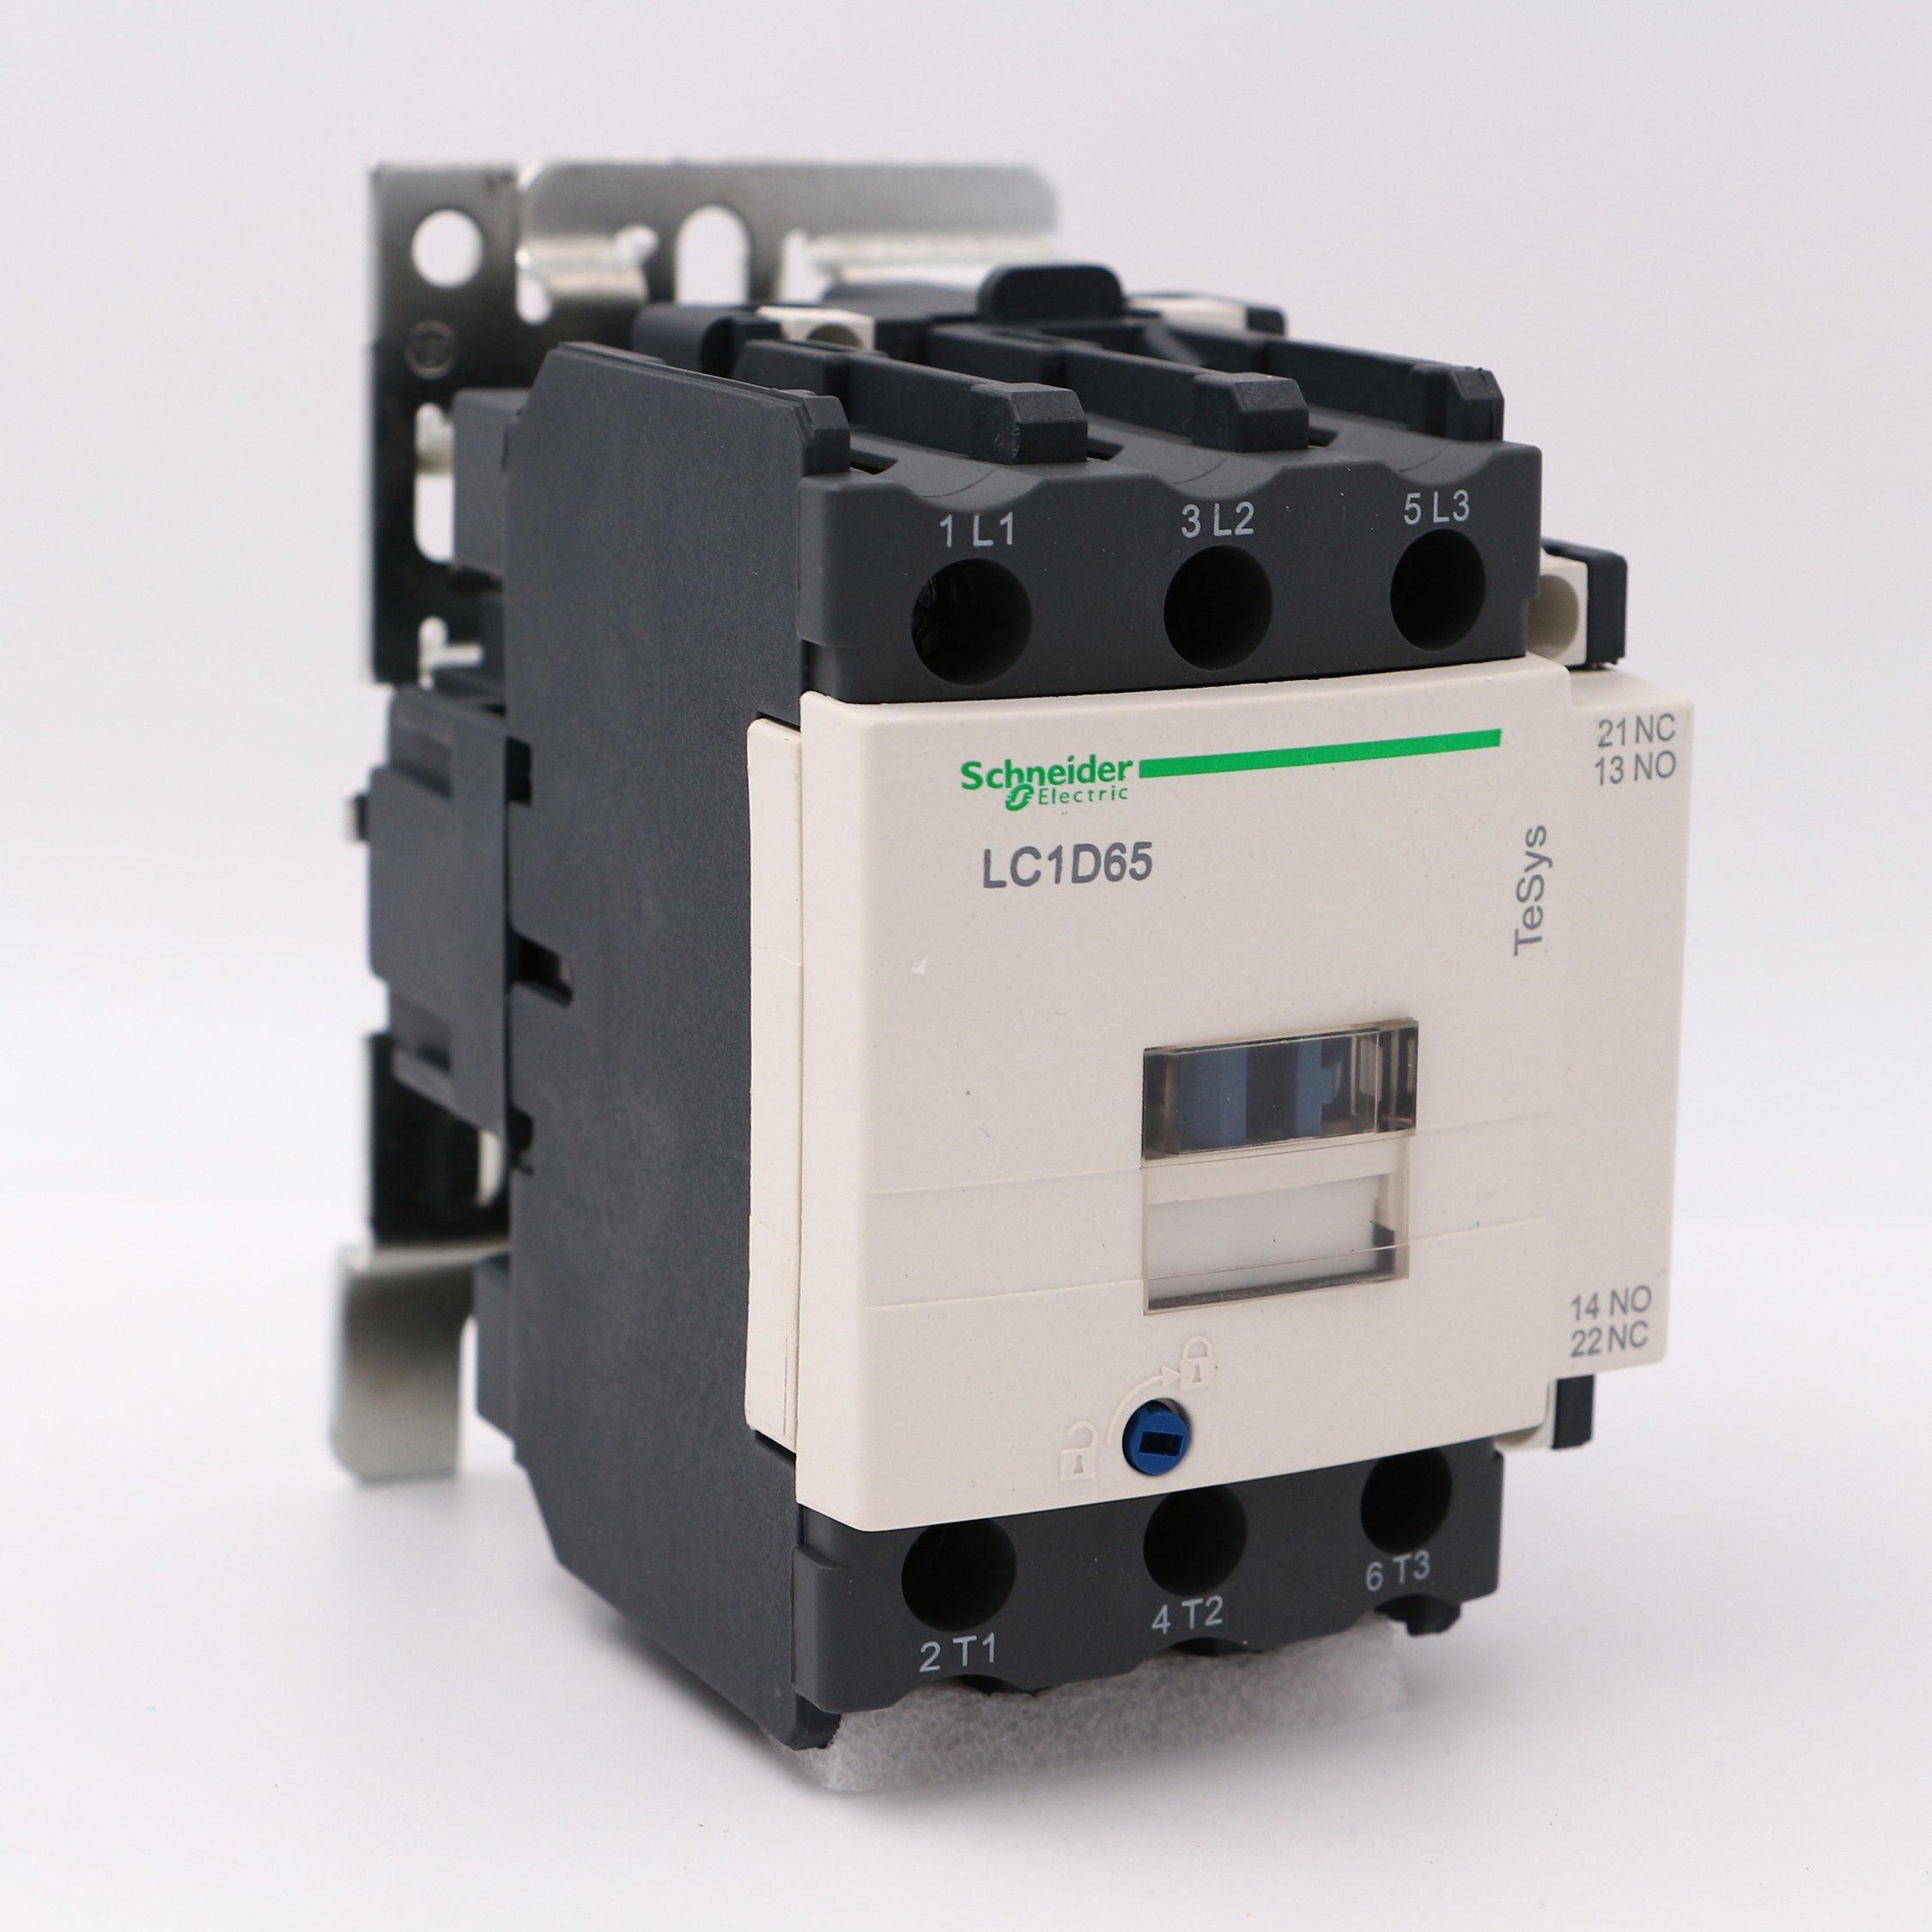 LC1D65M7 NEW SCHNEIDER AC Contactor LC1-D65M7 3P 65A 220V AC Coil